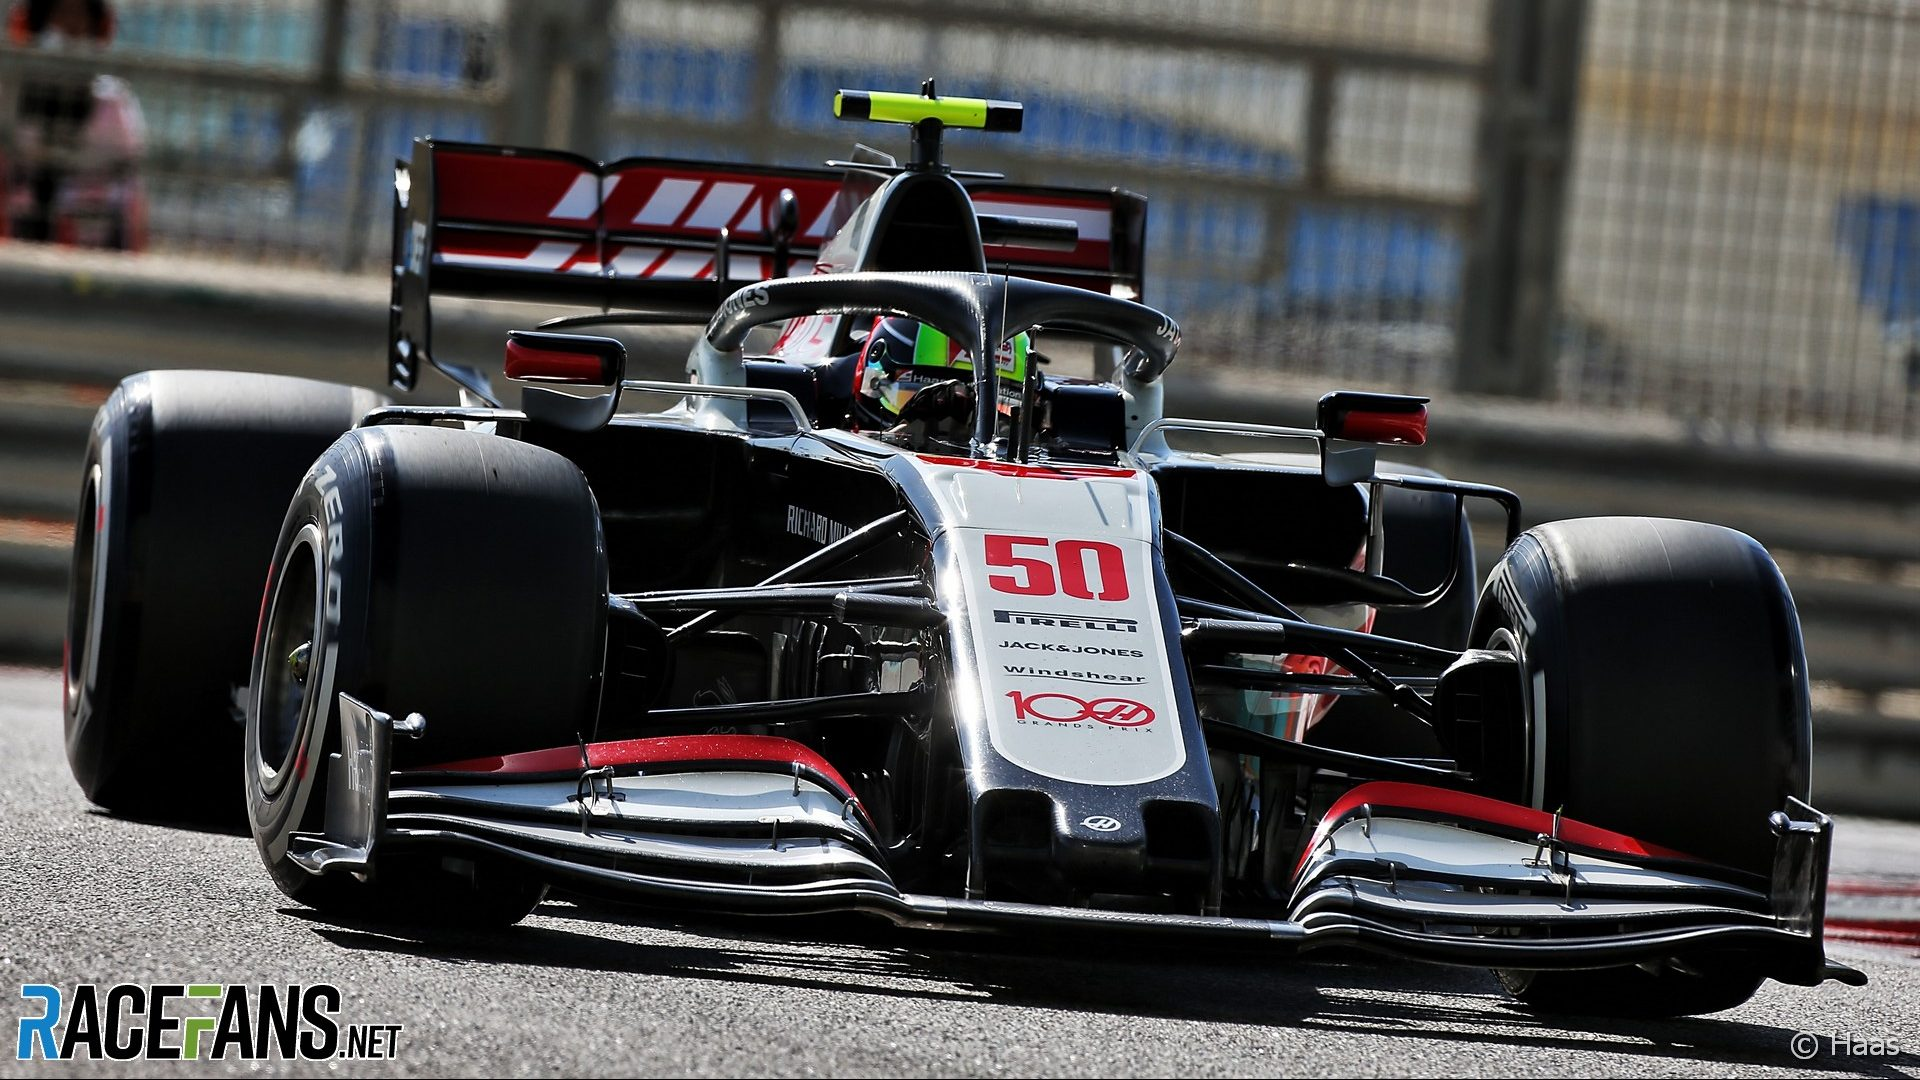 Mick Schumacher, Haas, Yas Marina, 2020